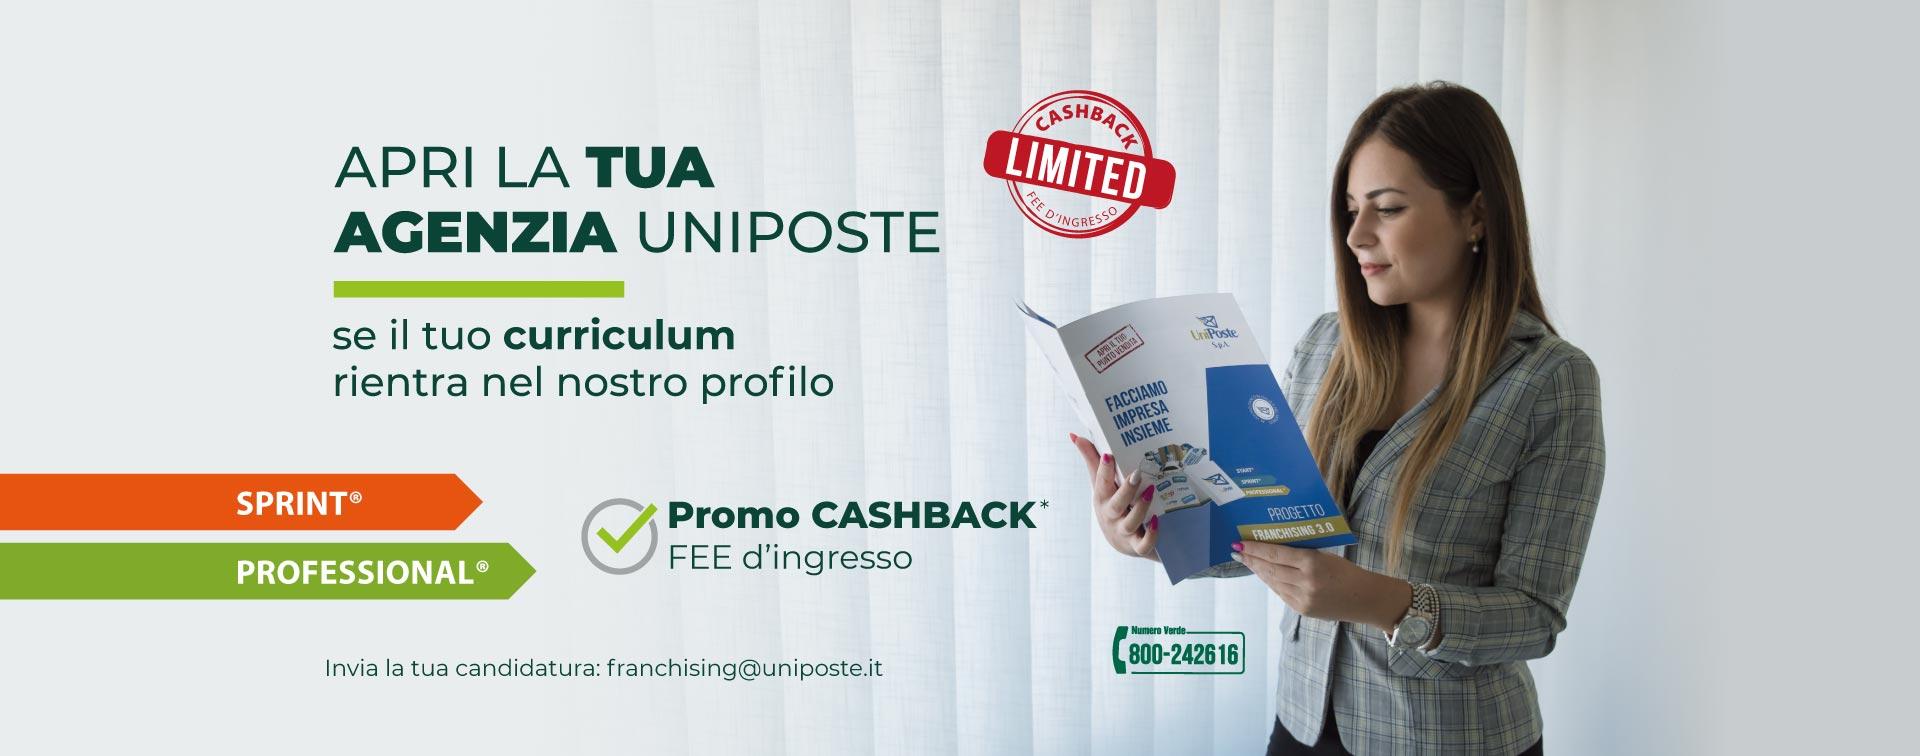 Offerta franchising UniPoste